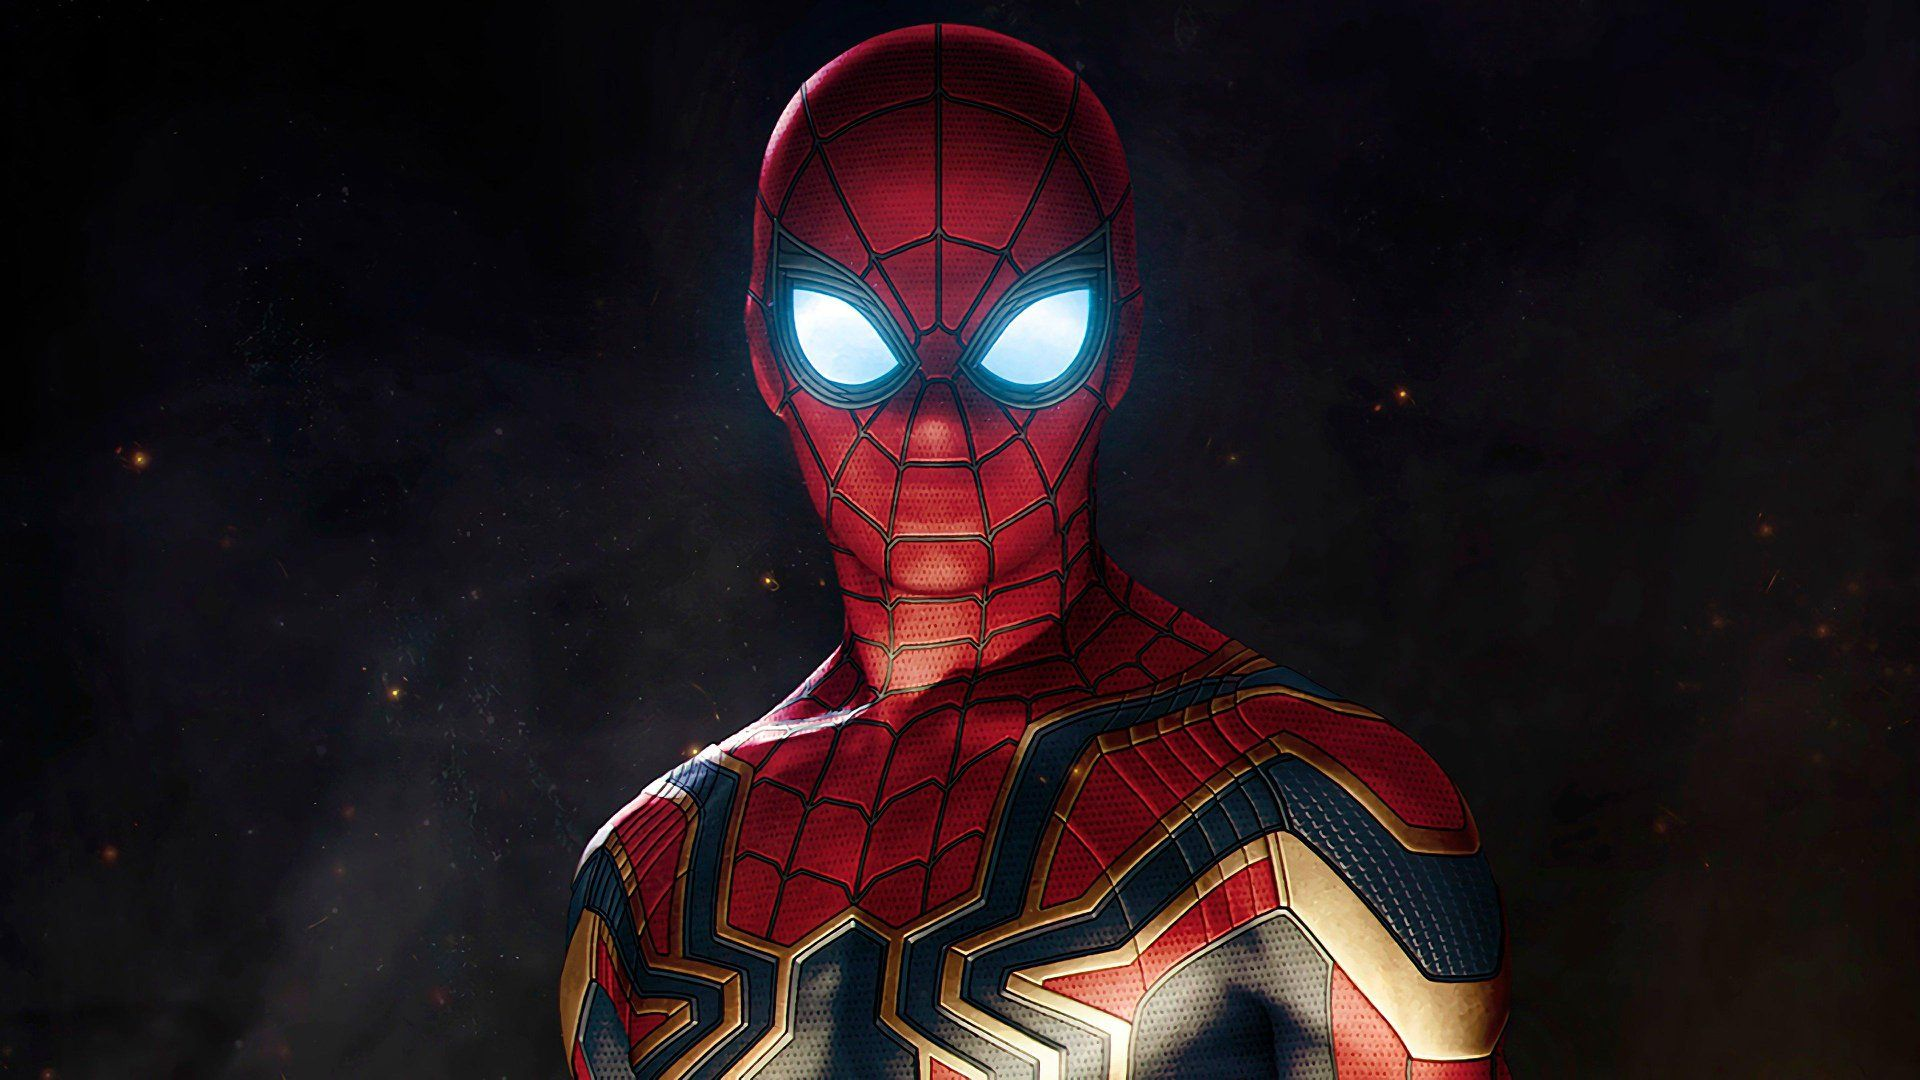 1920x1080 1080p Full HD, Google Pixel, Nexus 5x Avengers Infinity War, Spider